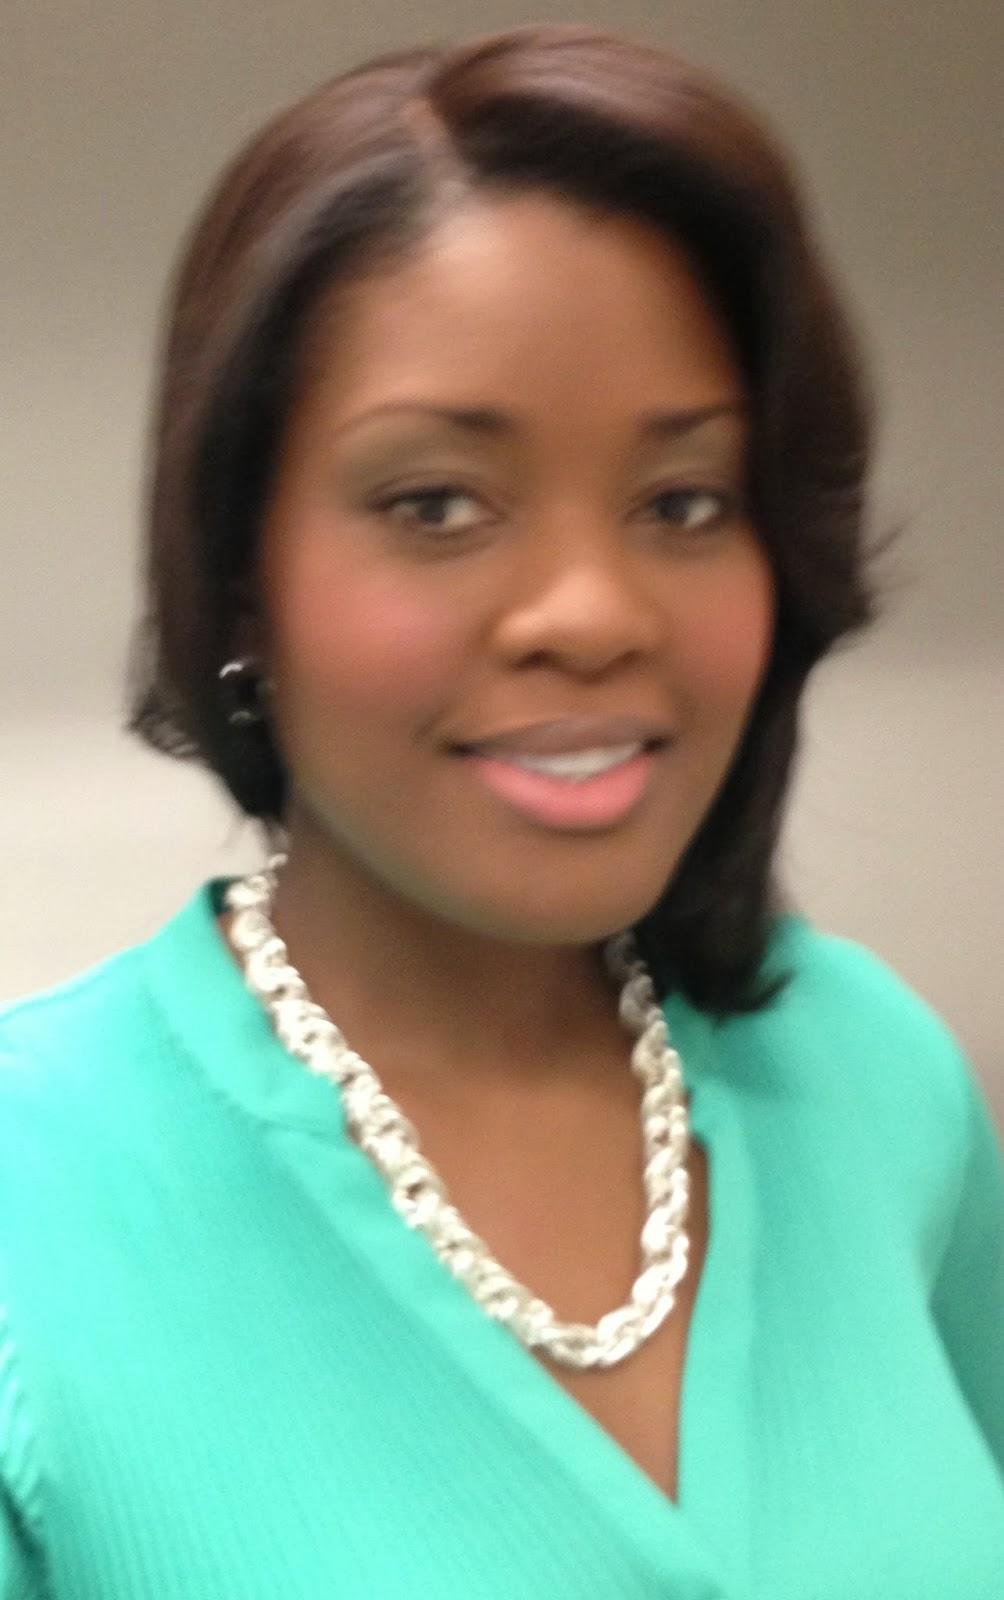 Tiffany Tarpley Joins The Channel 3 News Team   Director's Cut Blog